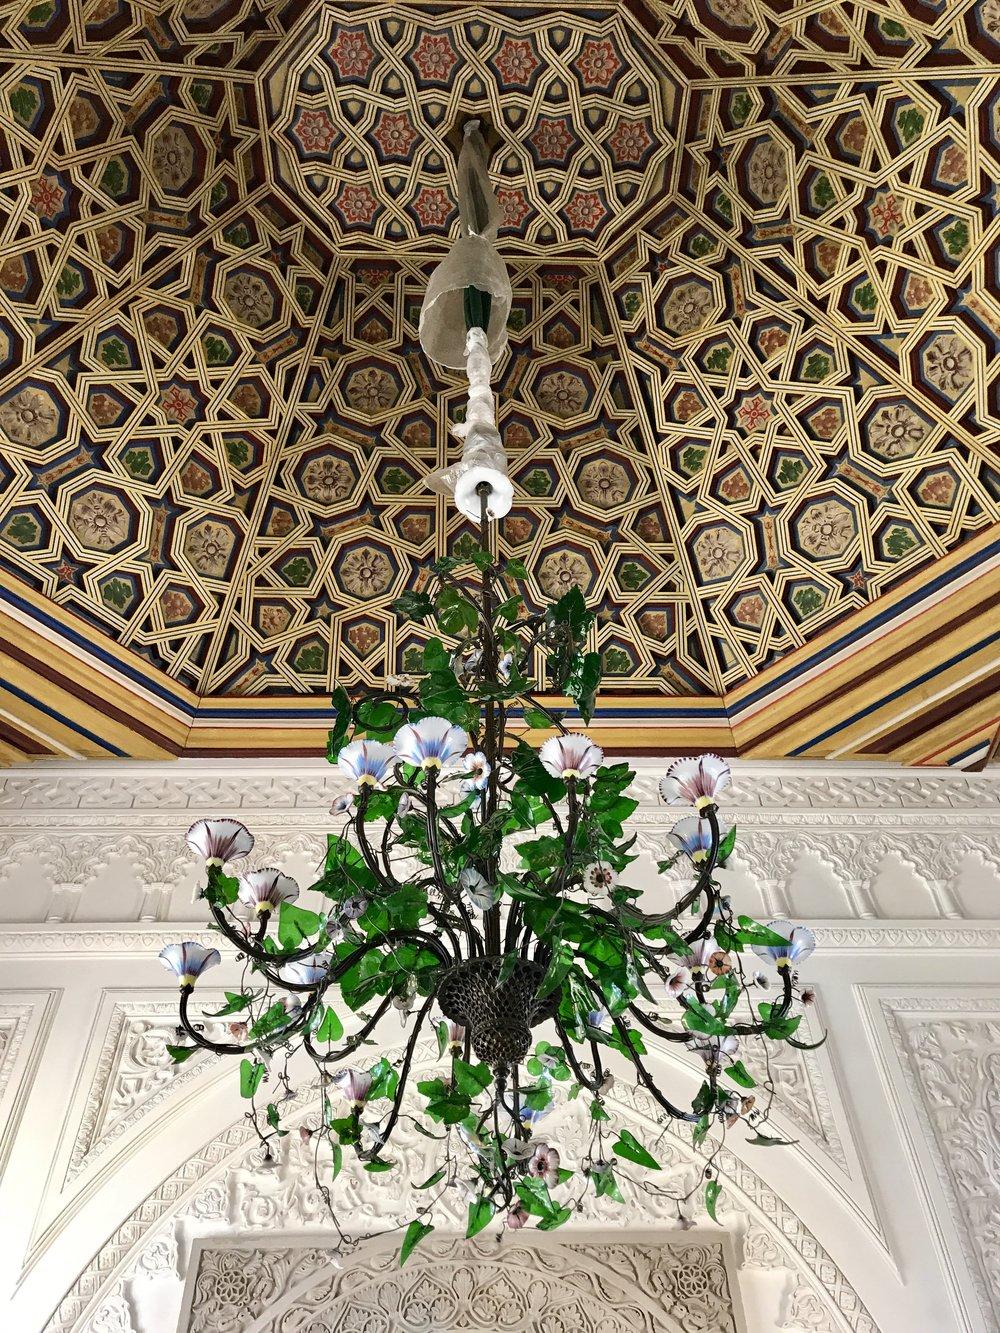 A beautiful chandelier in the queens room.